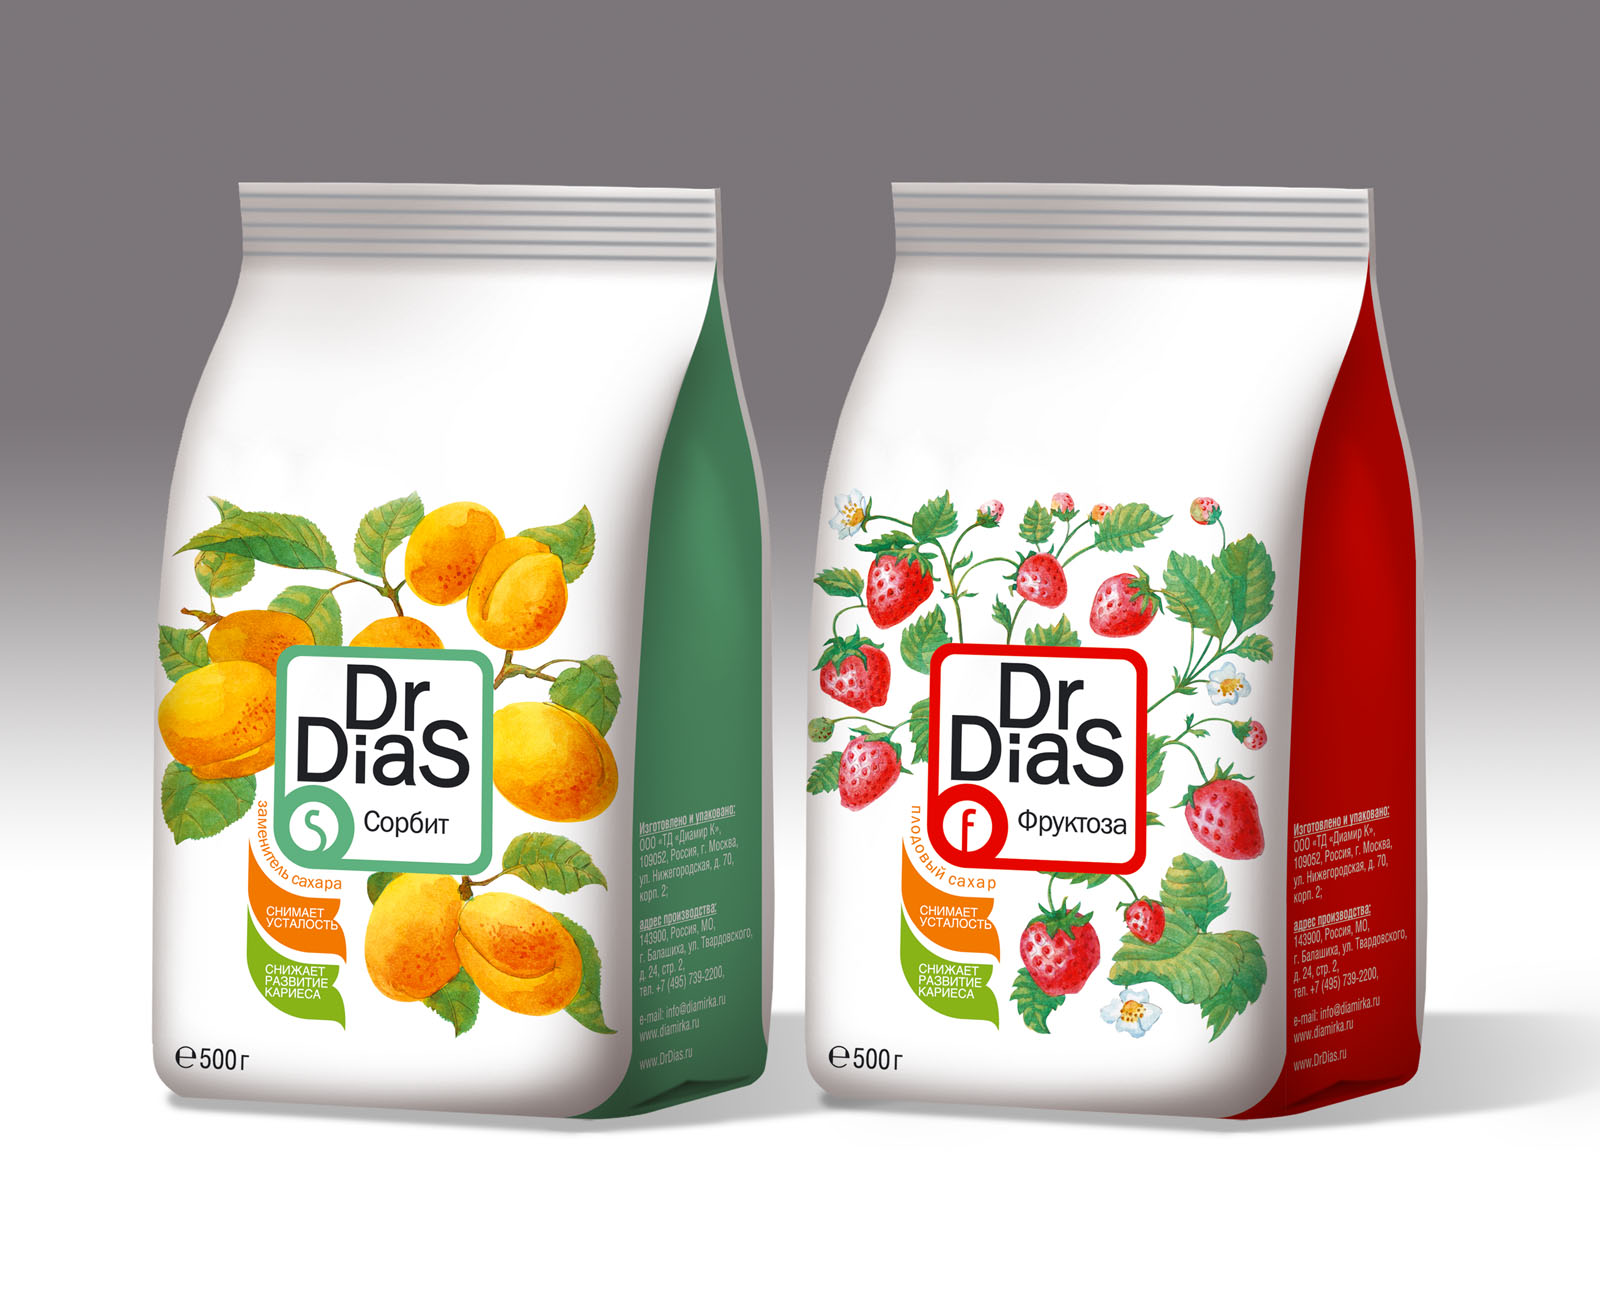 DrDias_5FS